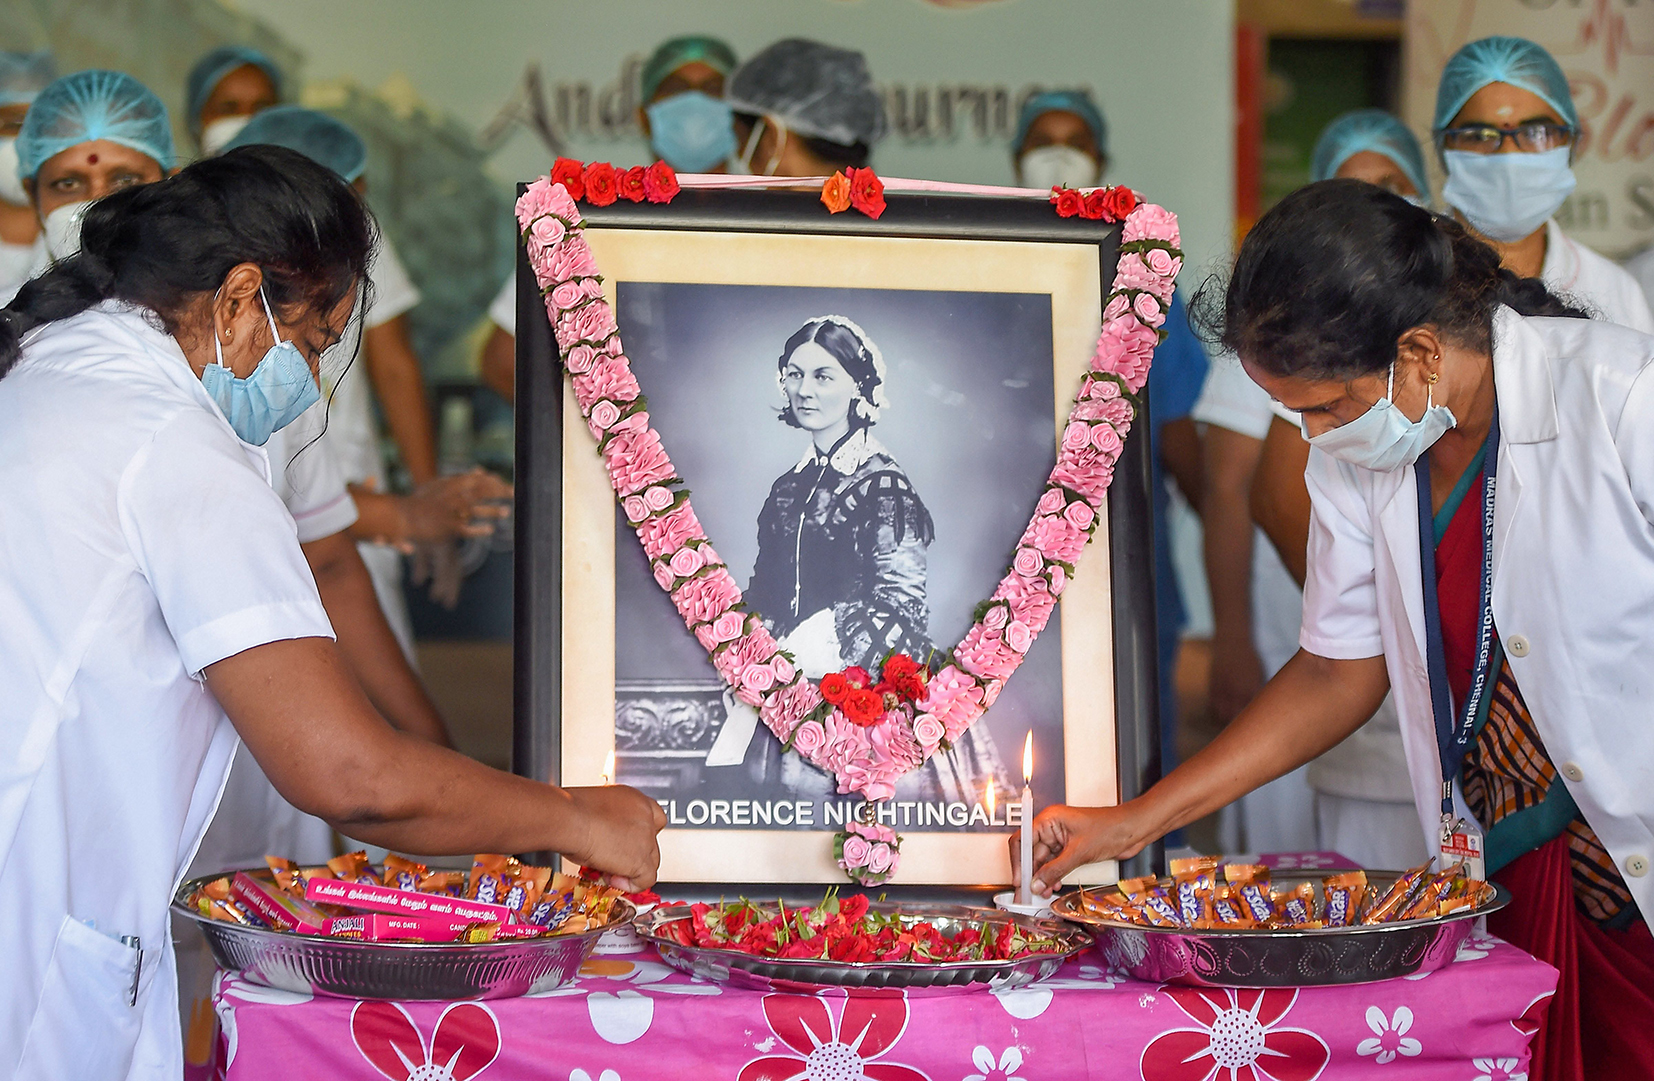 BEYOND CARE: Nurses at a Chennai hospital pay tribute to Florence Nightingale on International Nurses Day